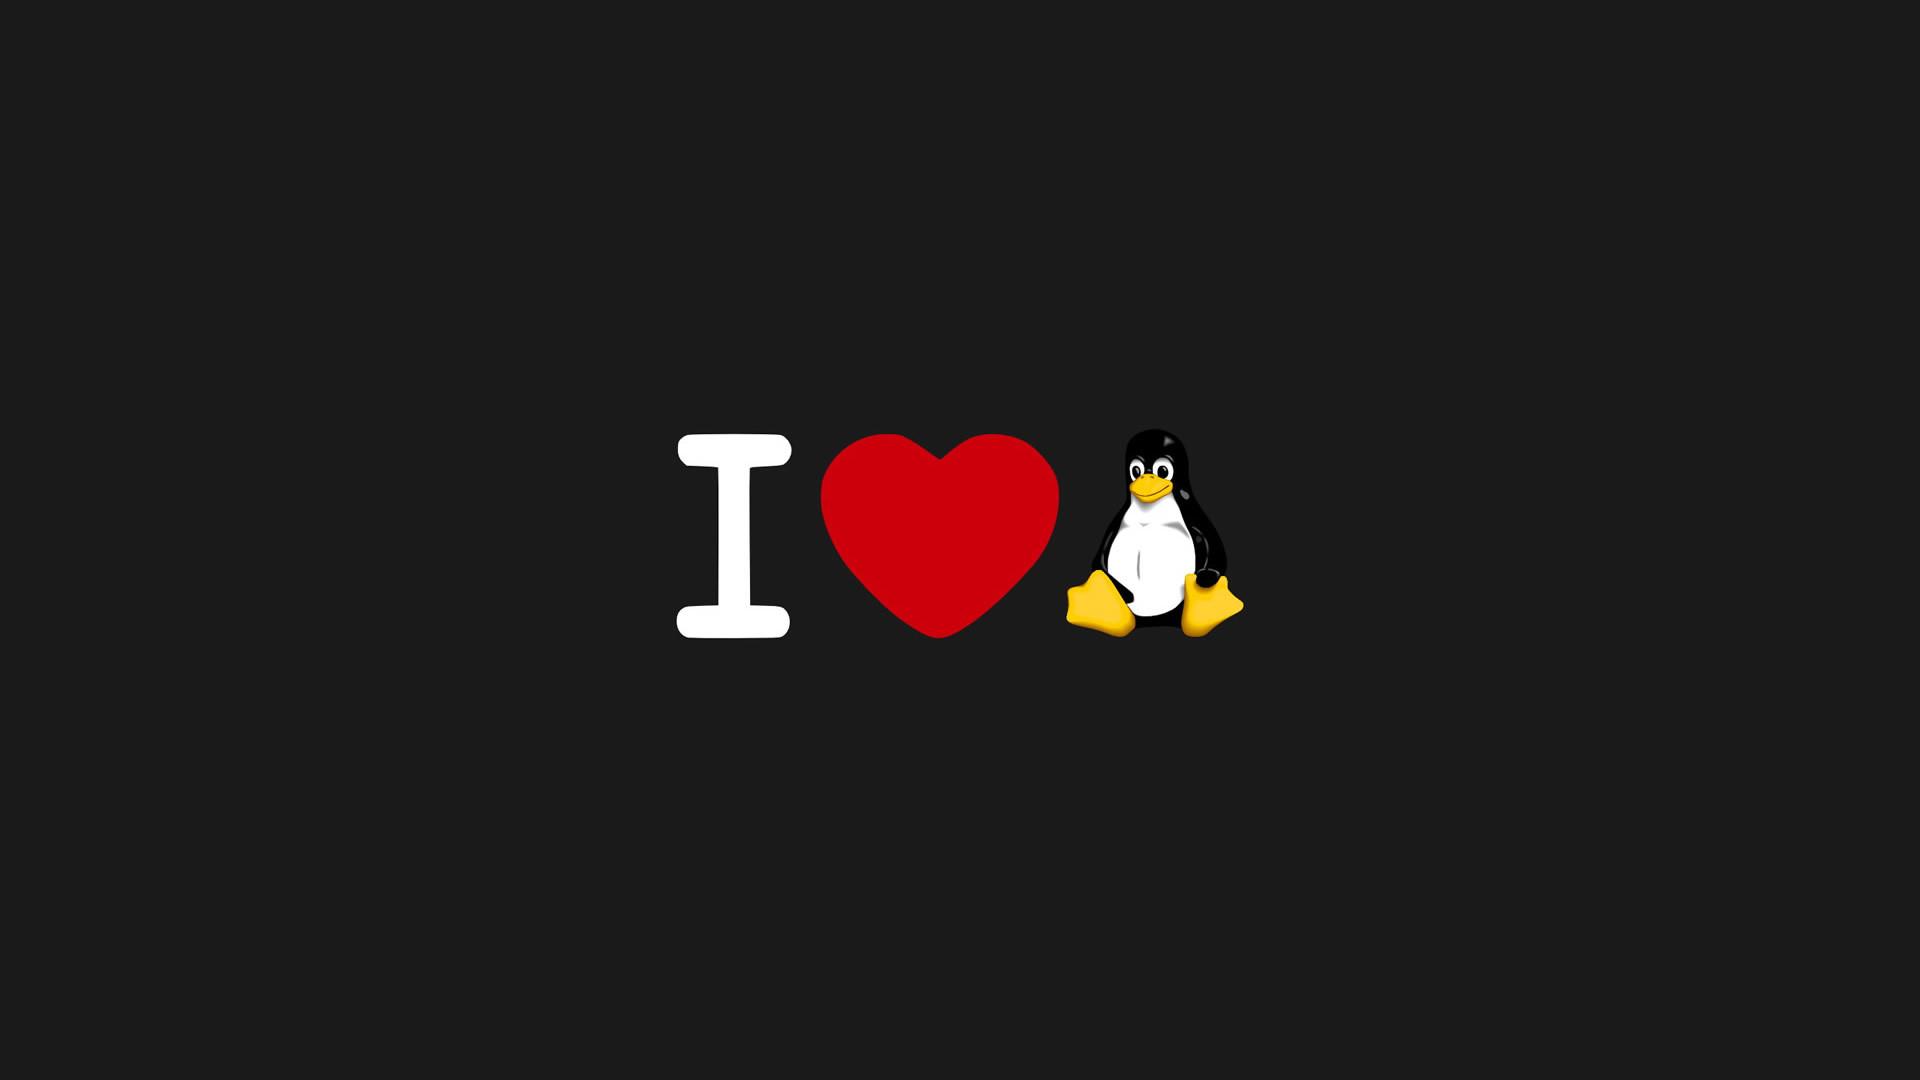 linux wallpaper hd – www.high-definition-wallpaper.com